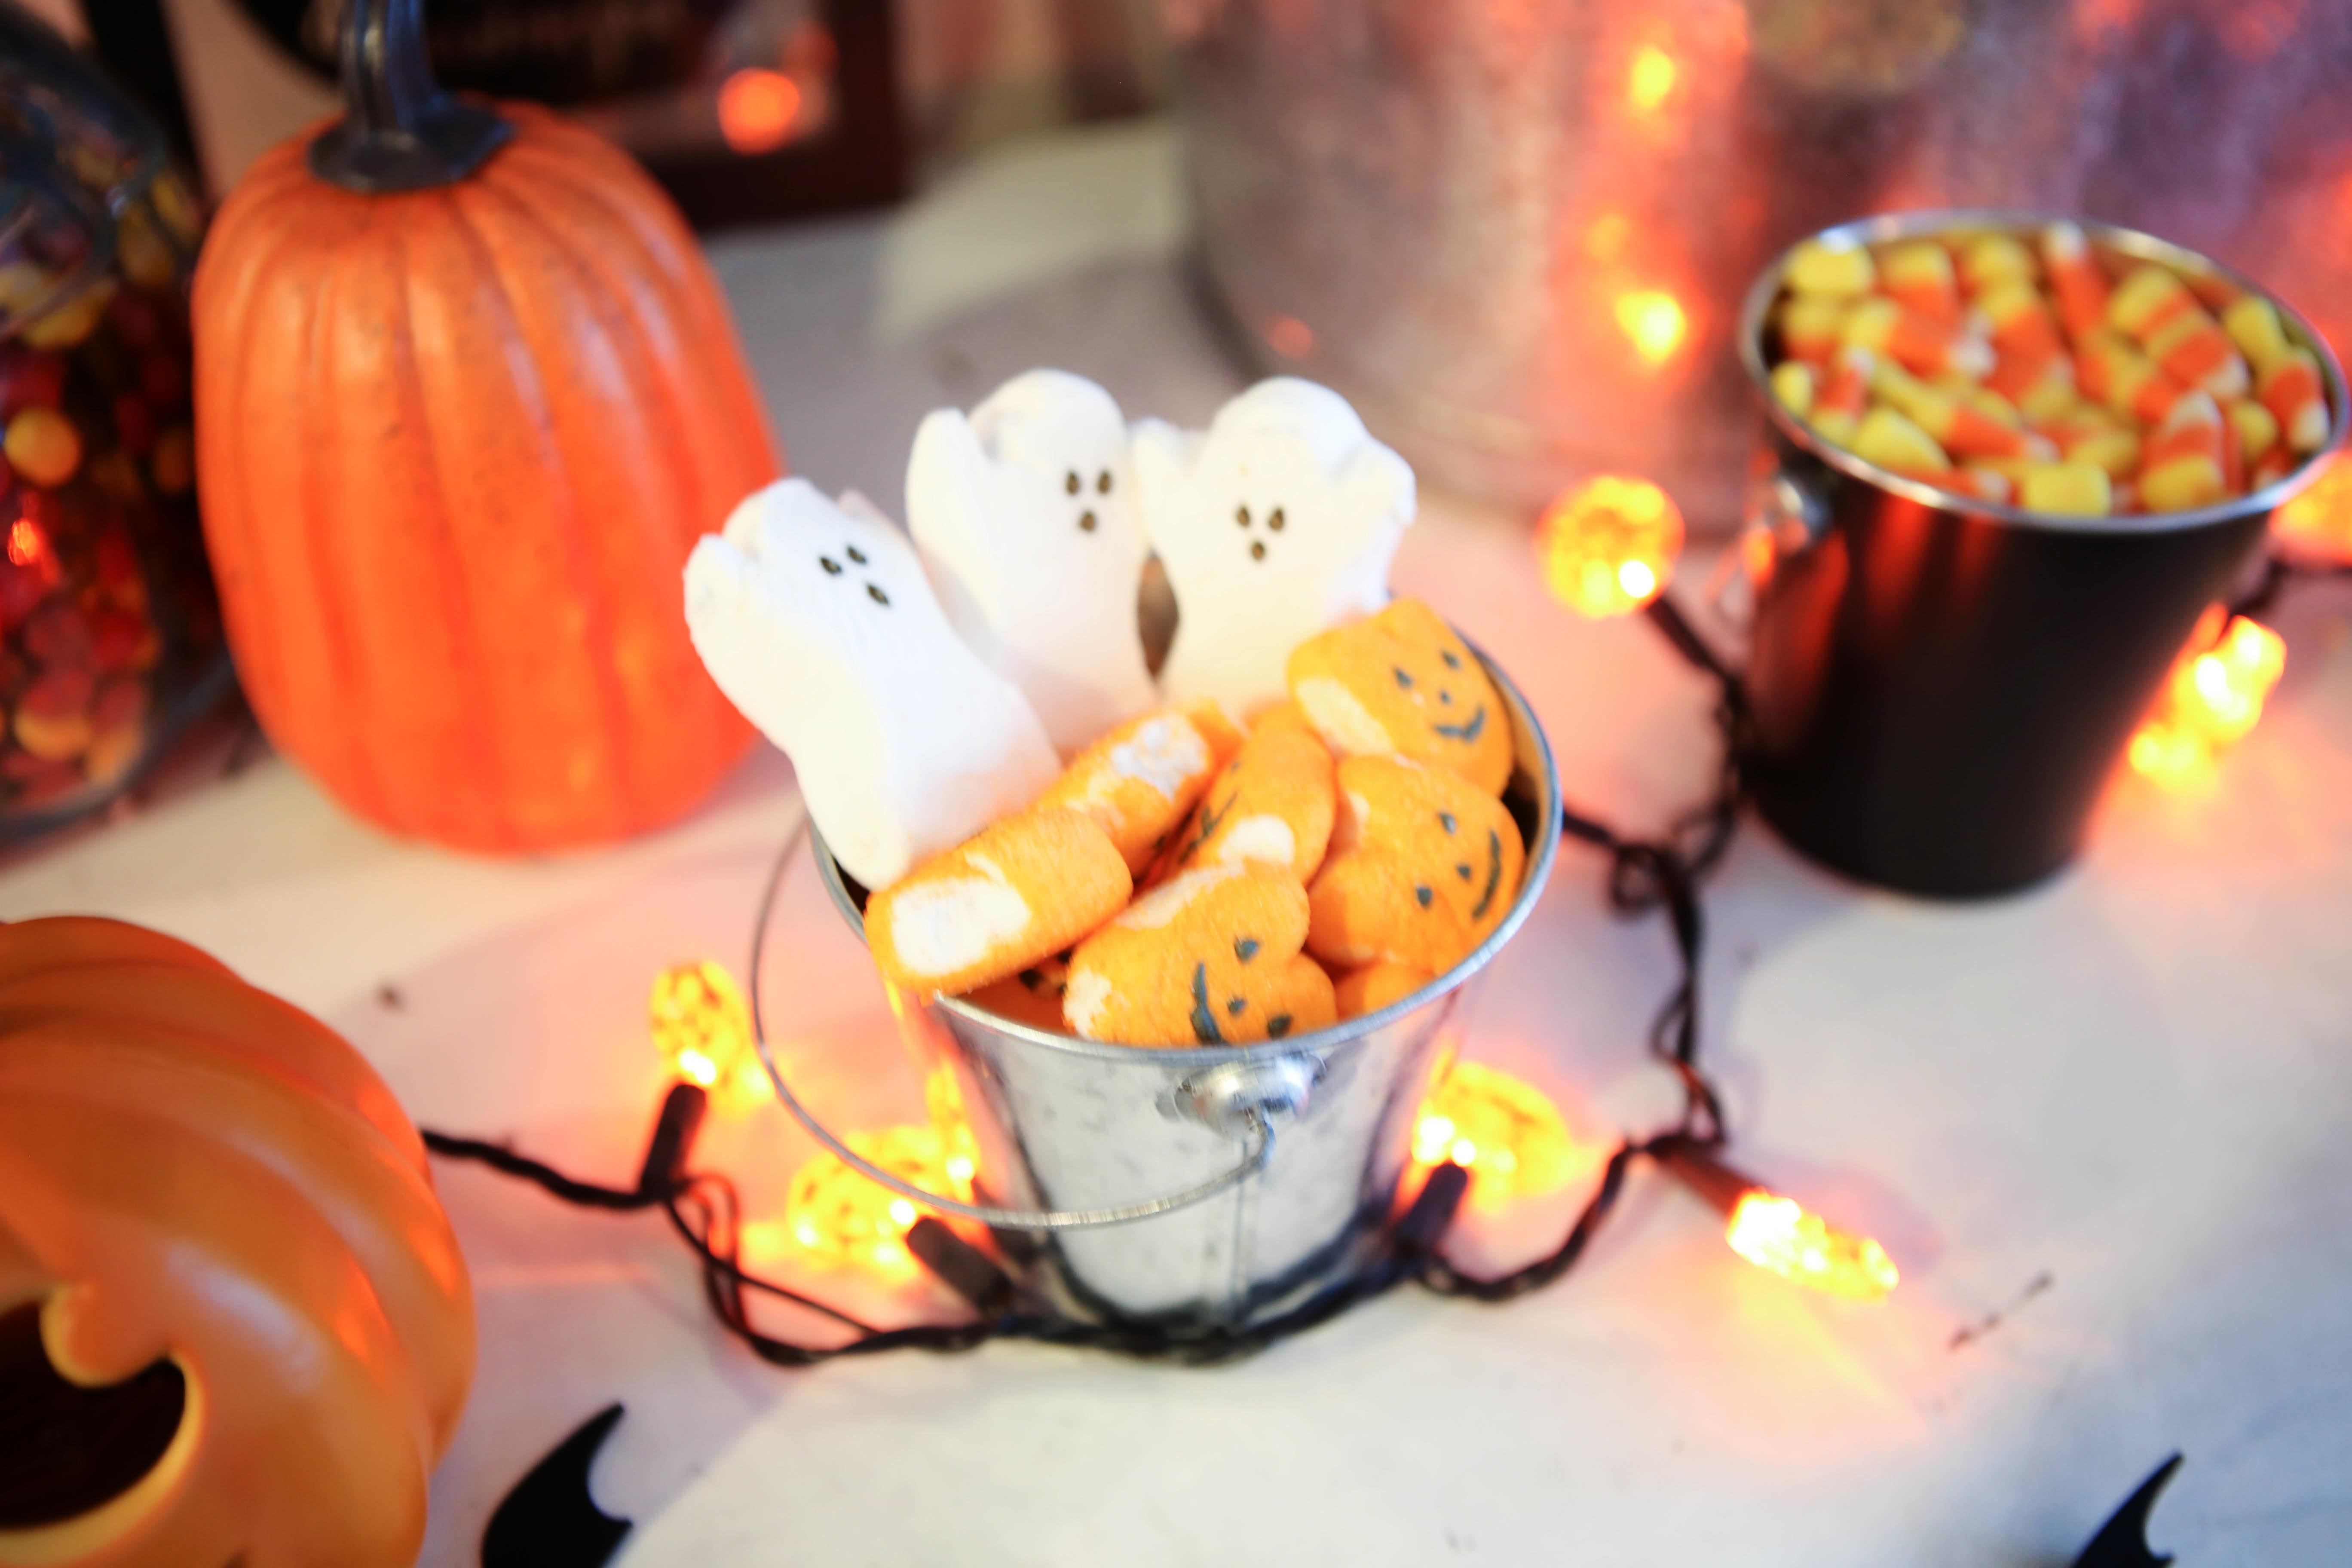 halloweenpeeps - Halloween Popcorn Bar by Atlanta lifestyle blogger Happily Hughes